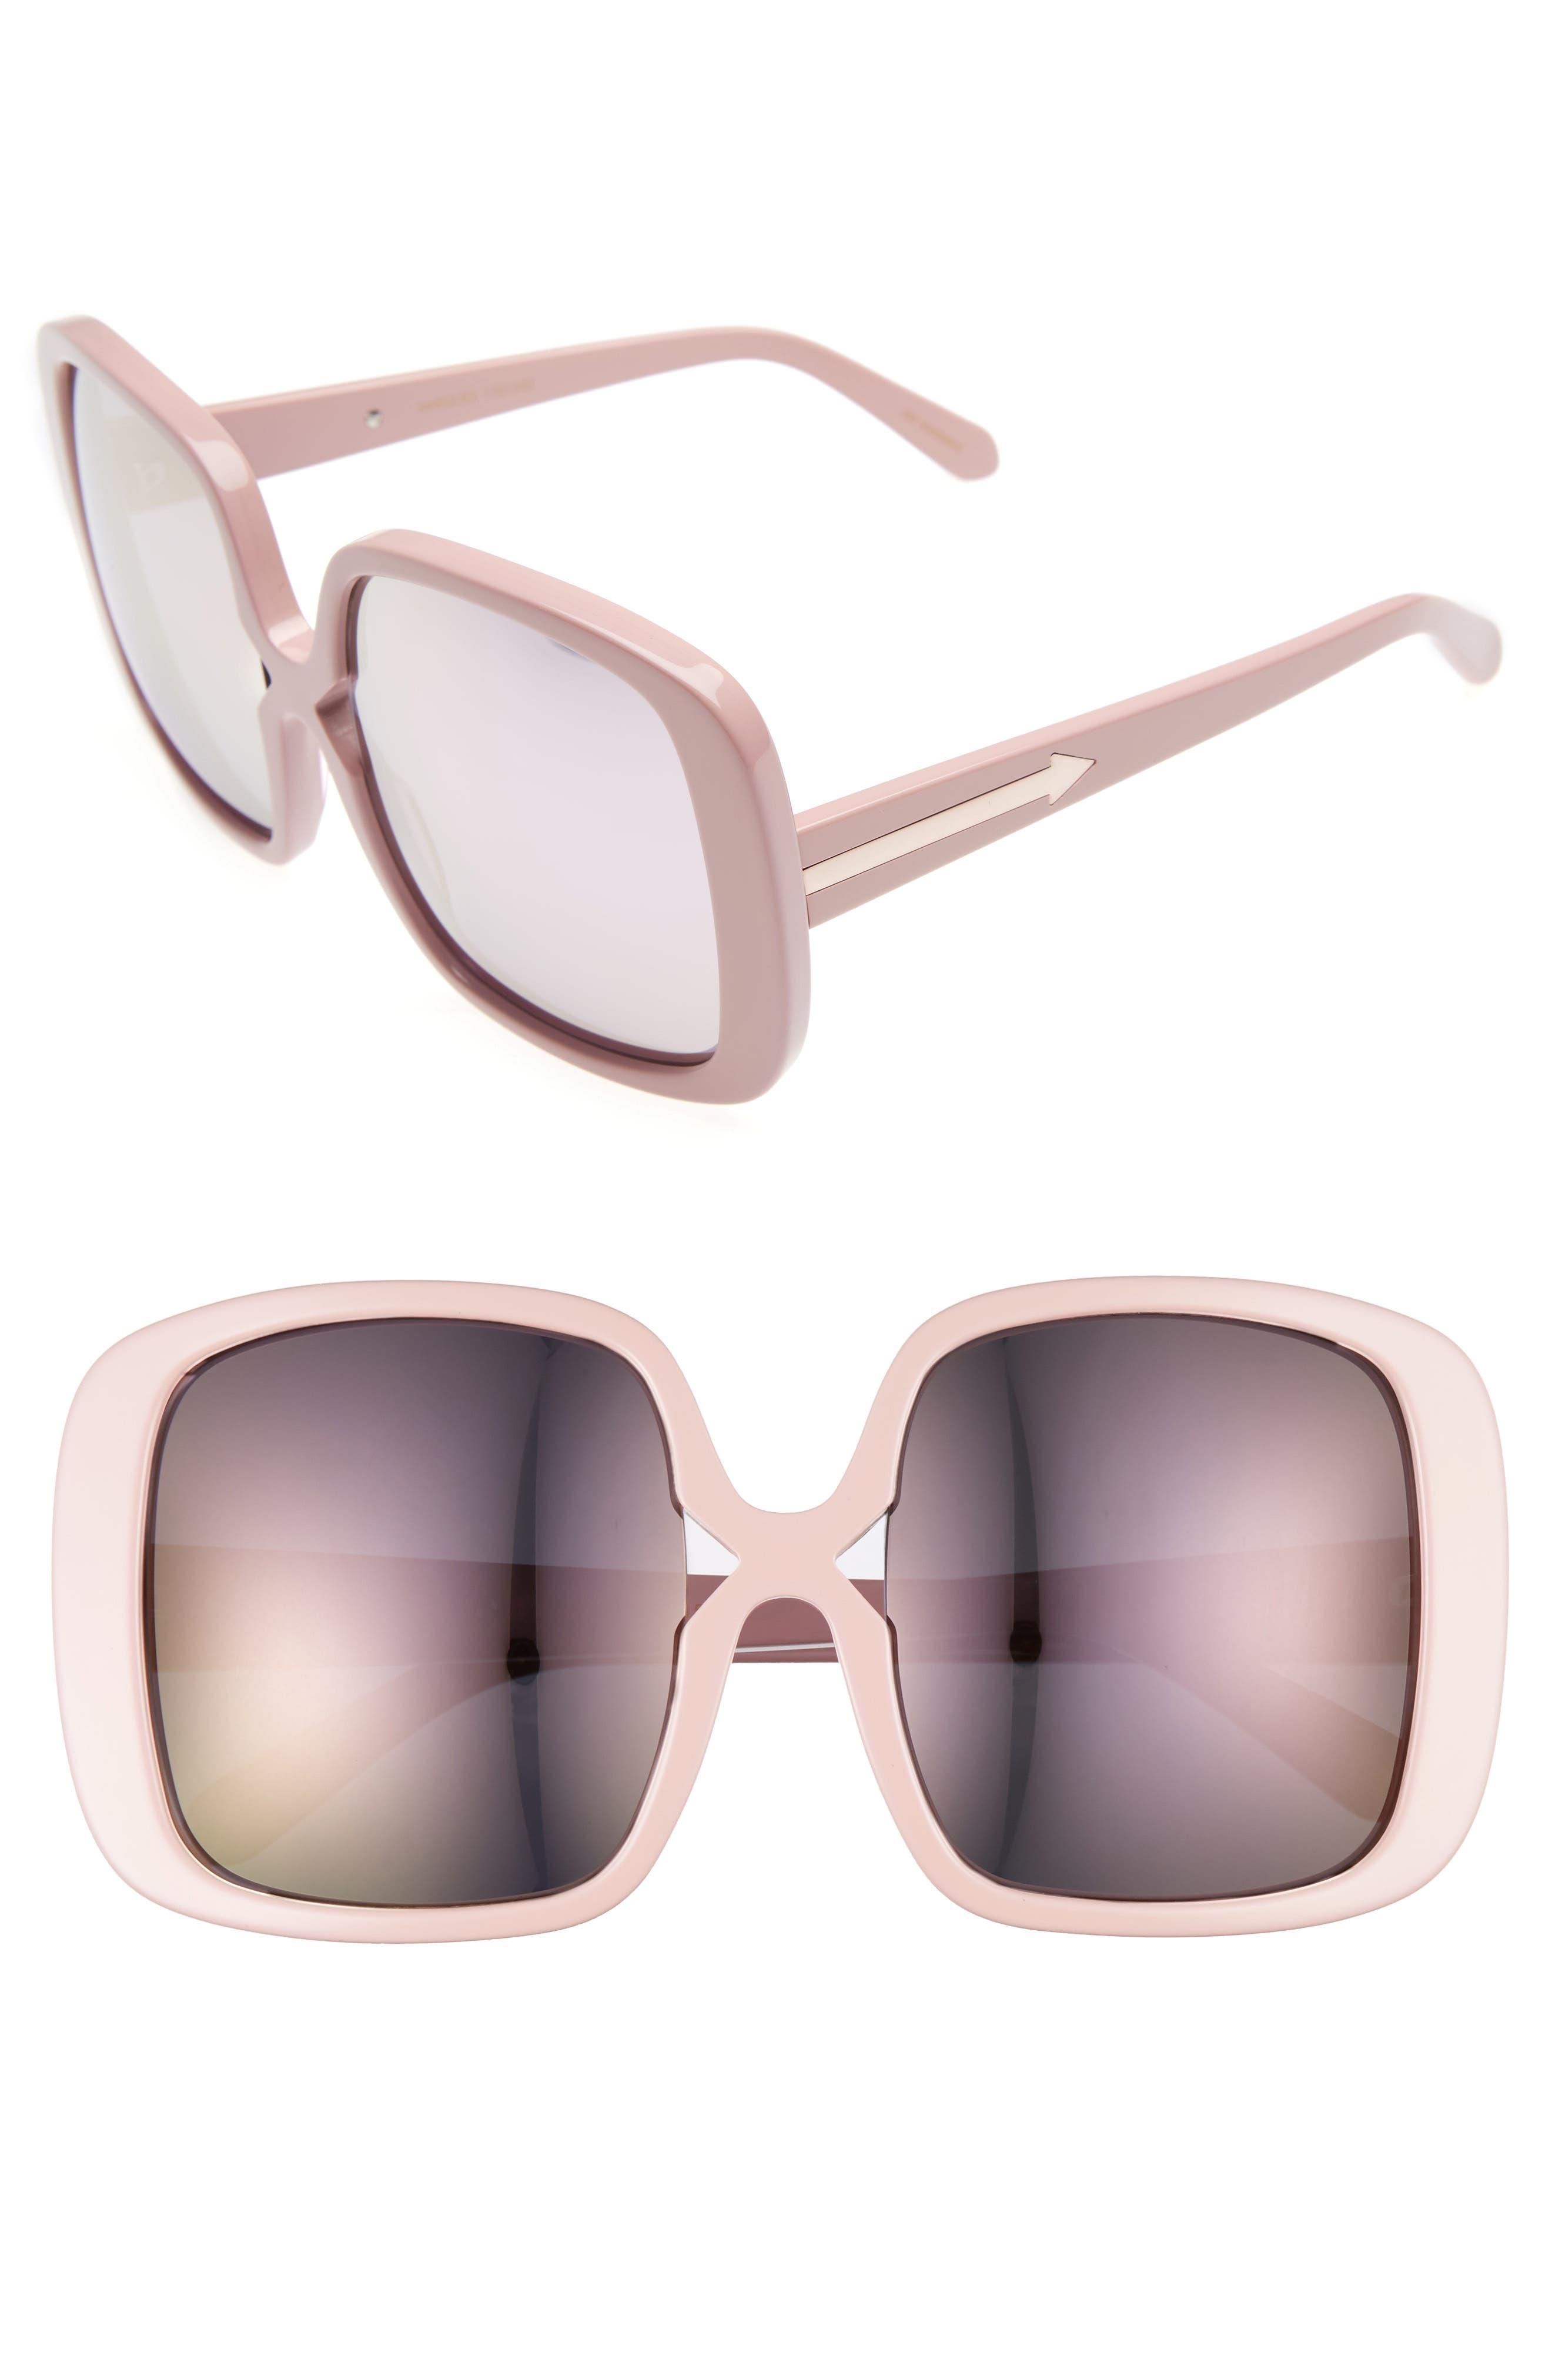 Karen Walker Marques 55mm Square Sunglasses